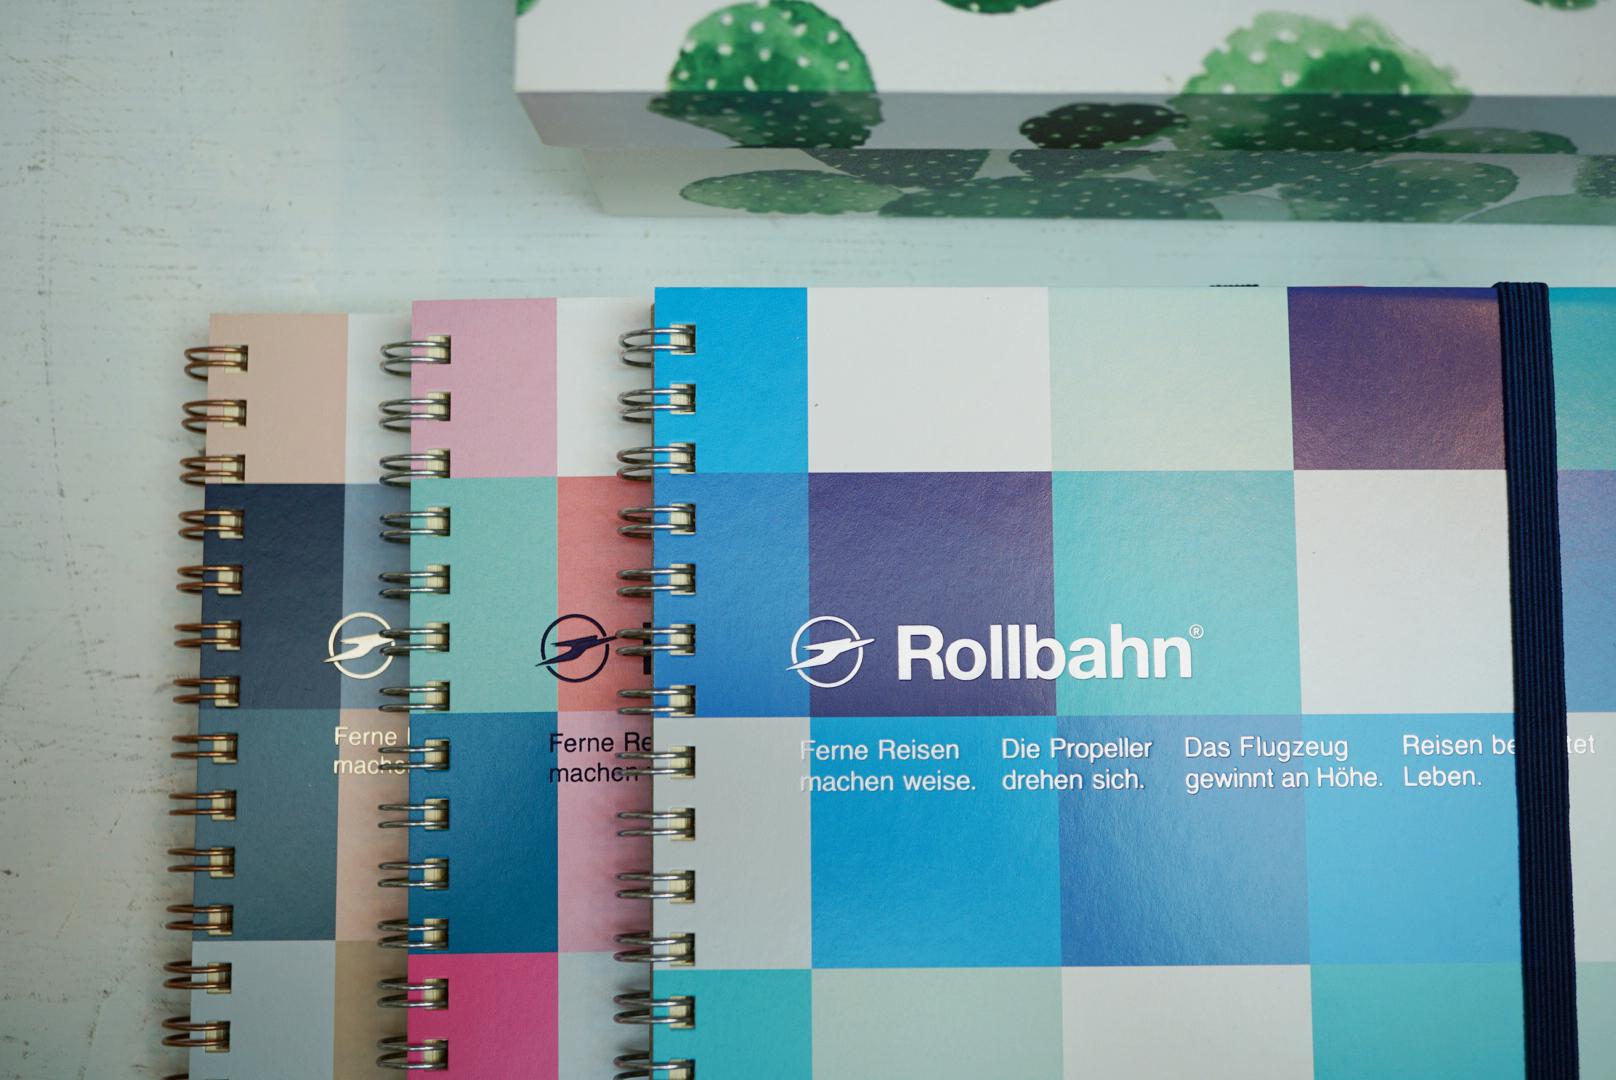 bts rollbahn aug 2017.jpg